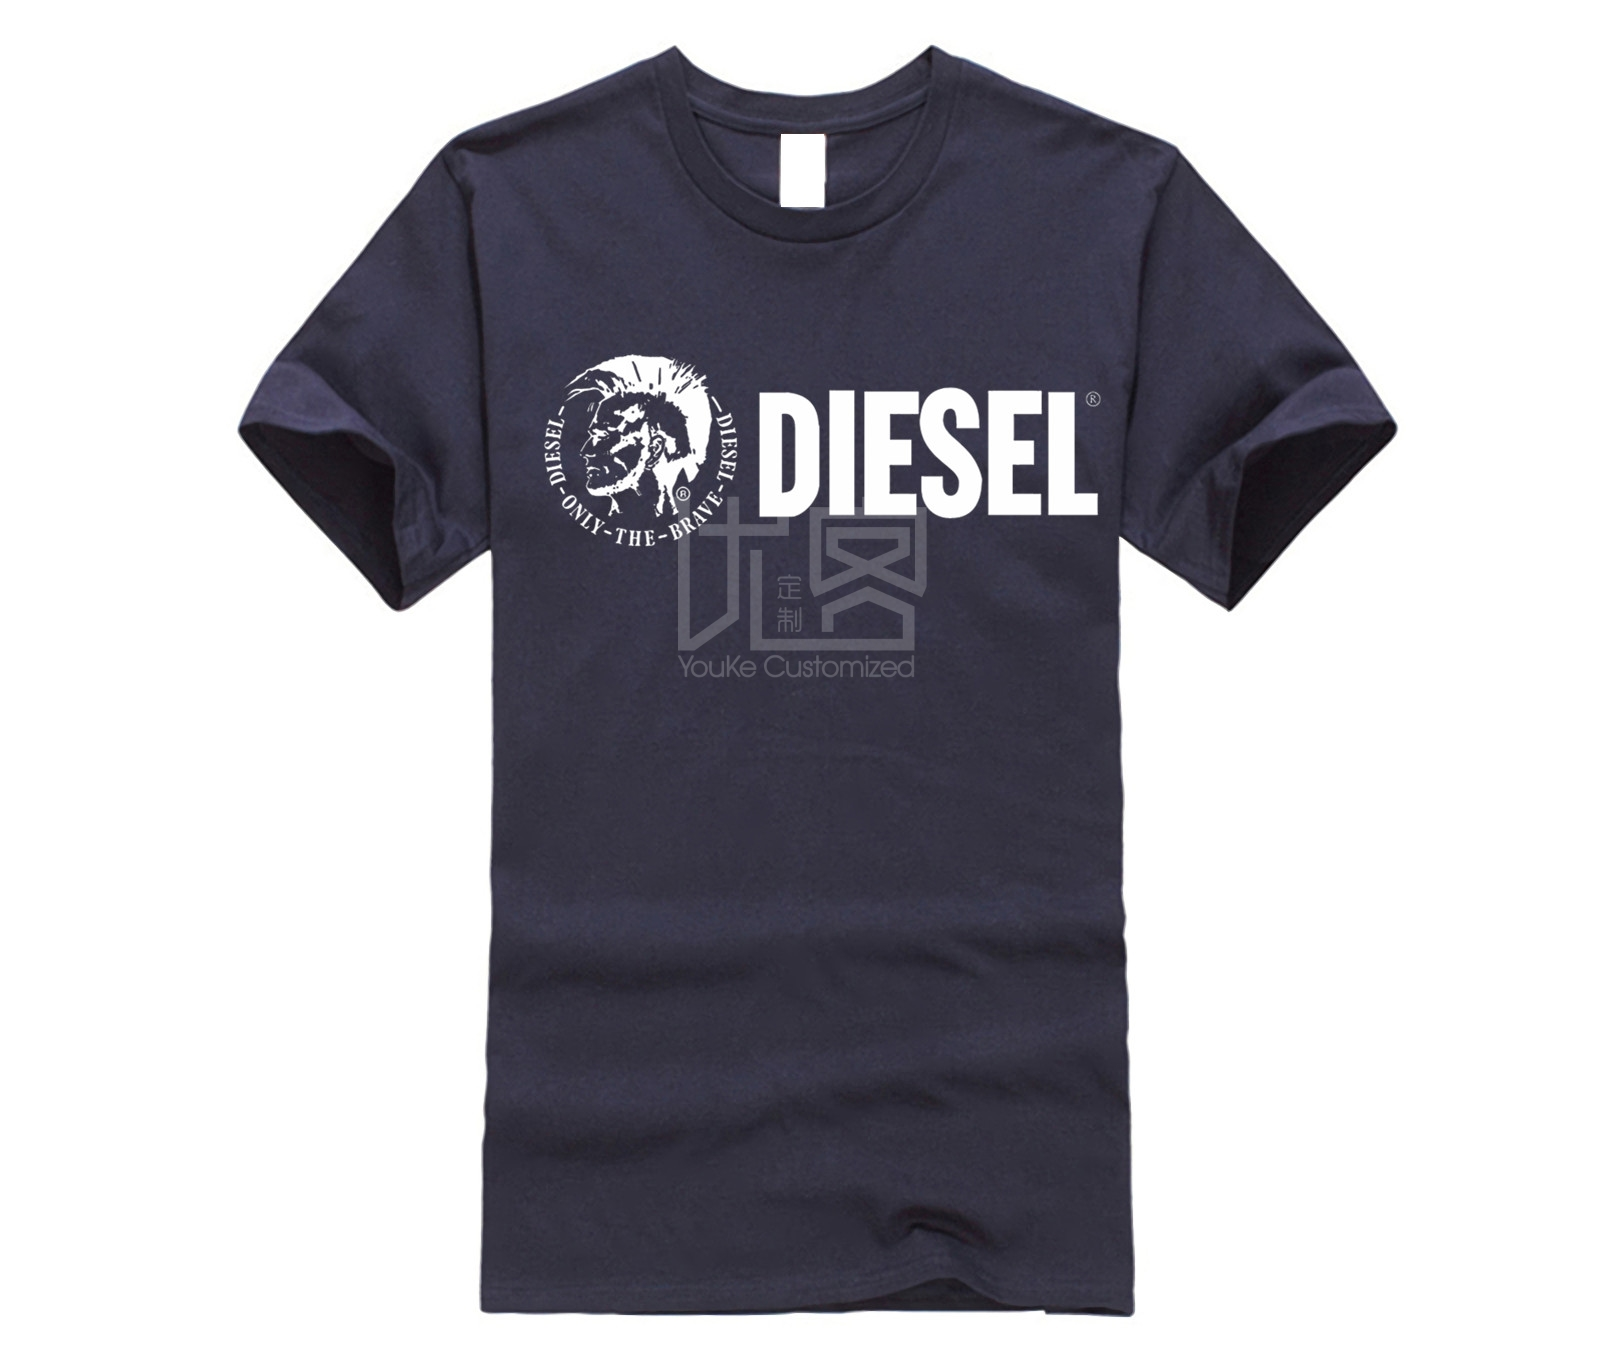 DIESEL Fashion Men Free Shipping Men's T-shirt Simple Short Sleeve Street Men New